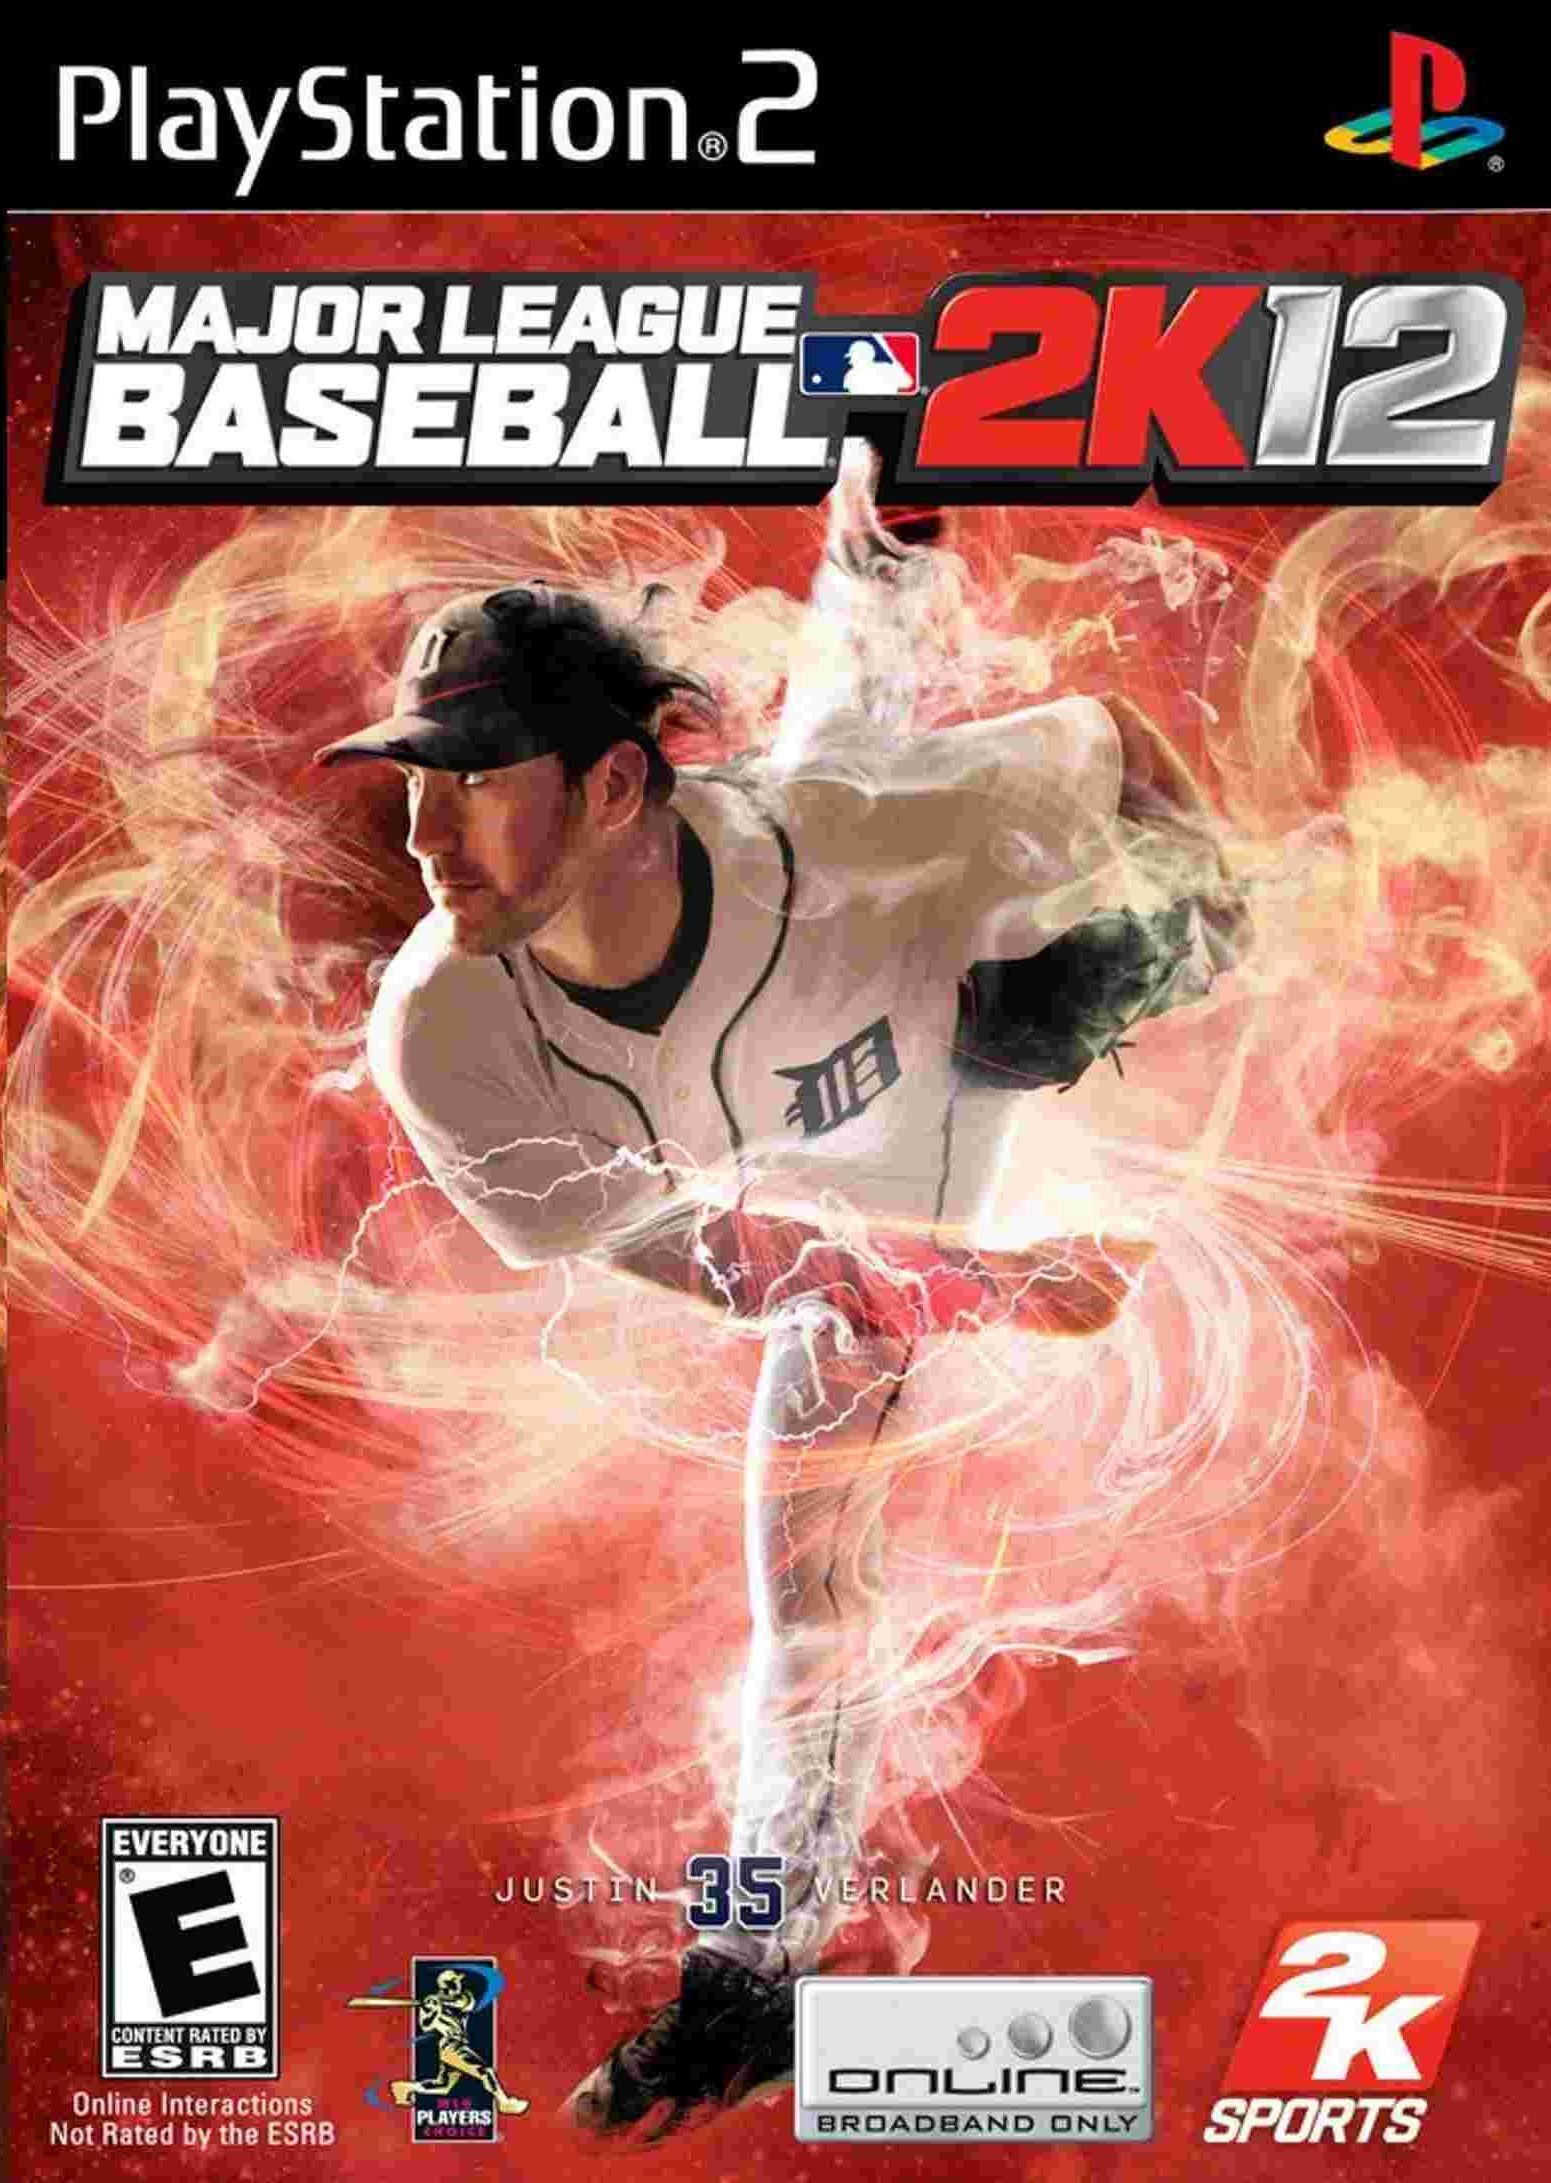 Pin by Aaron Viles on PlayStation Major league baseball